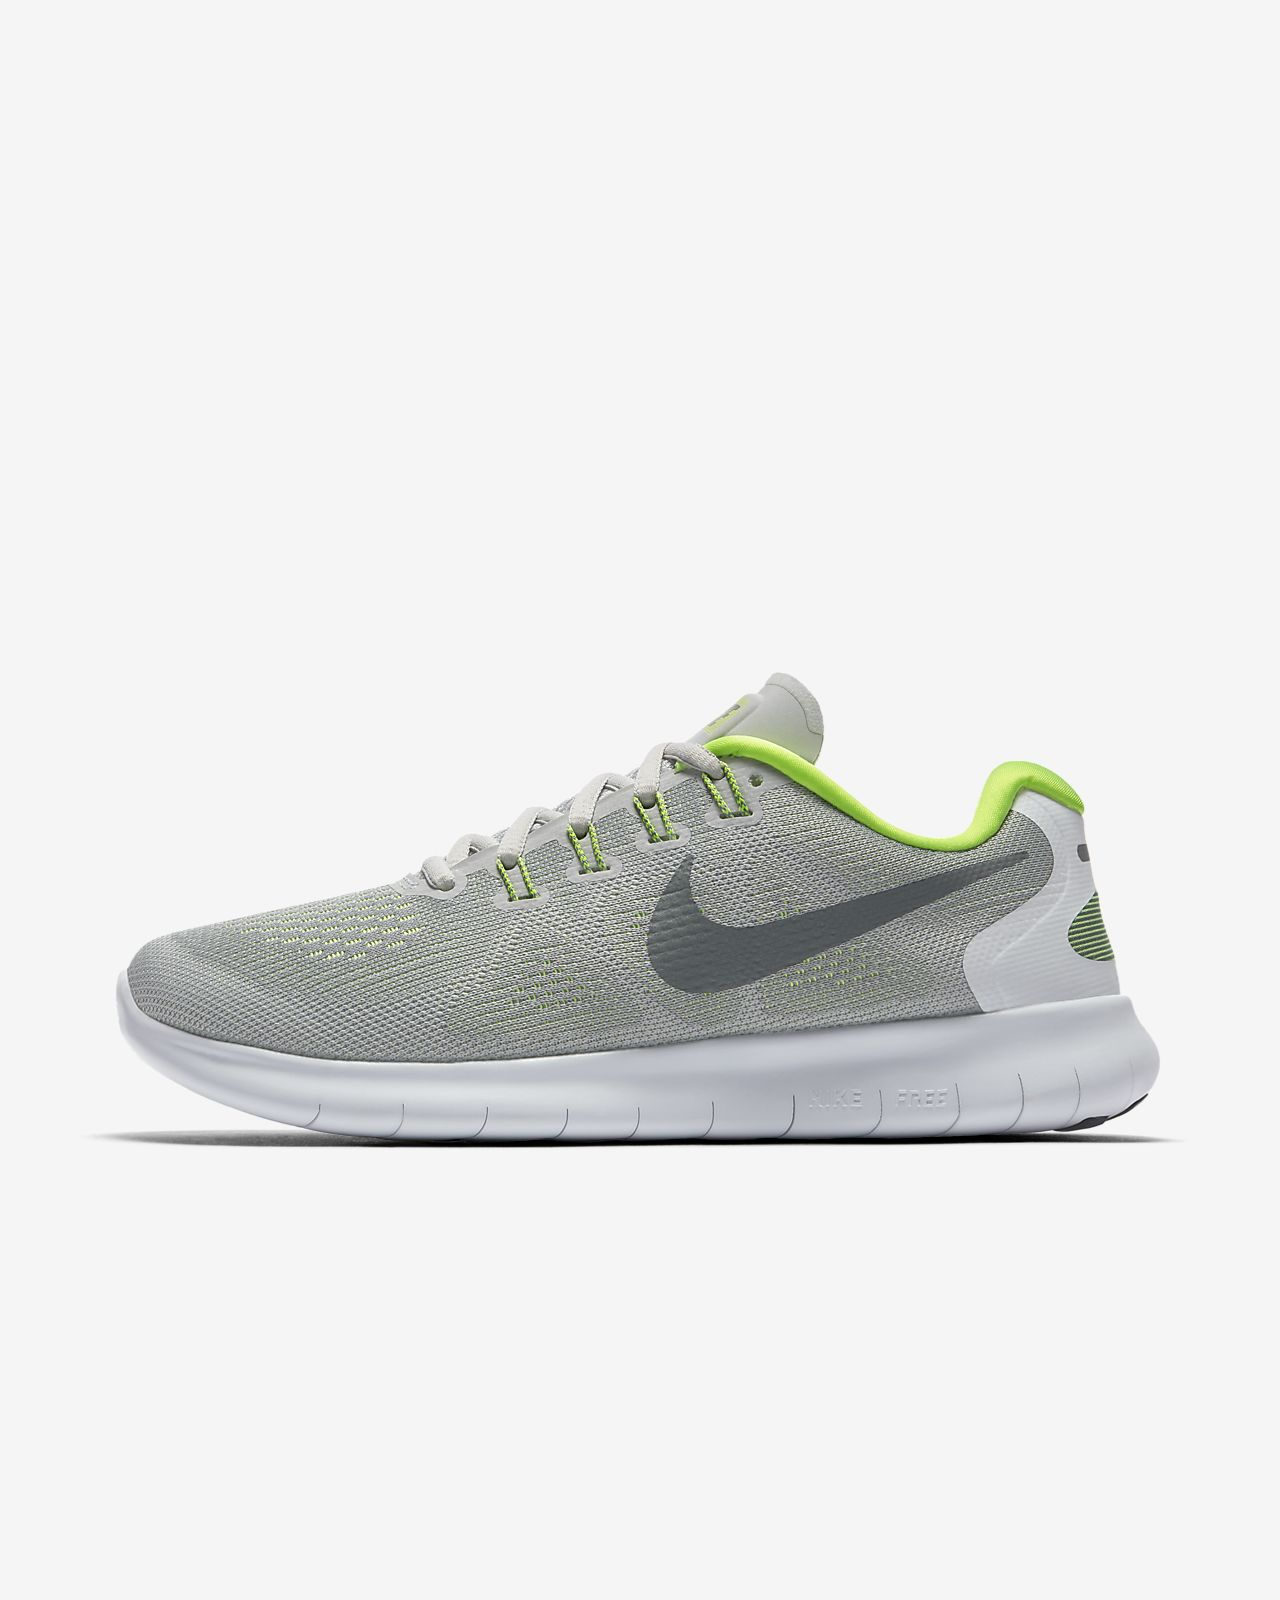 NUOVA linea donna Nike FREE RUN 2017 Sneaker UK 5 Corsa/Palestra 880840 100